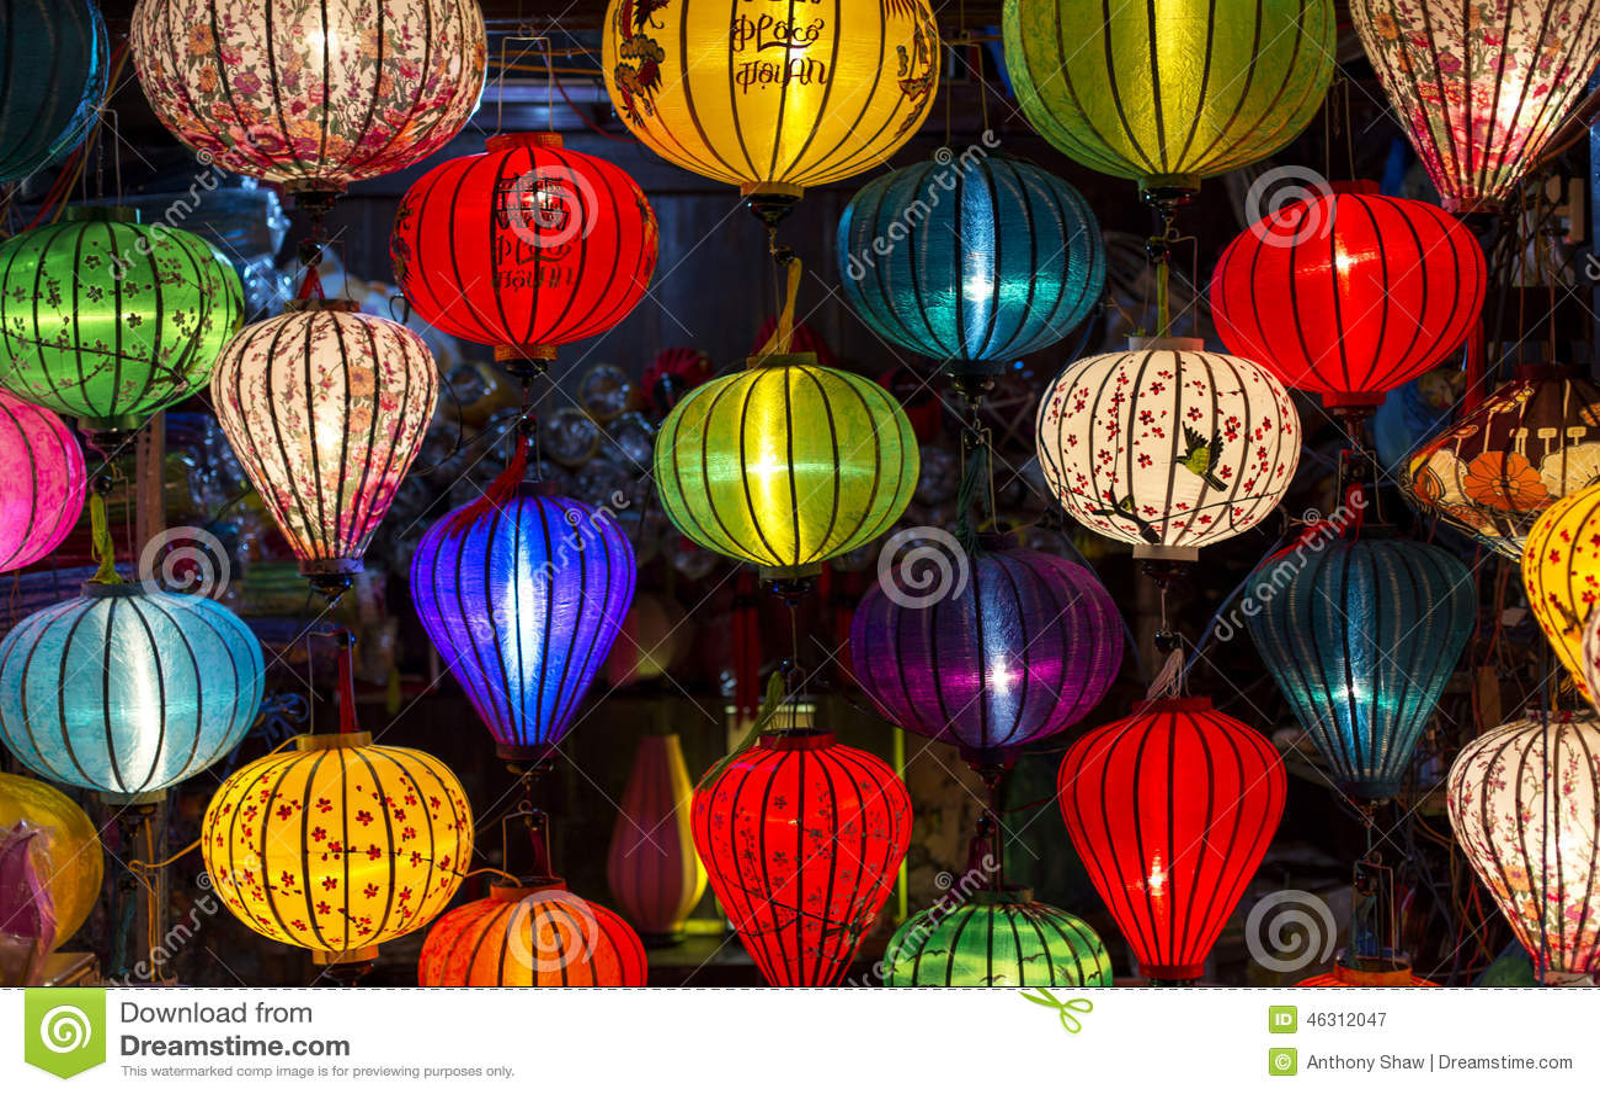 Lanterns at old town shop in Hoi An, Vietnam.